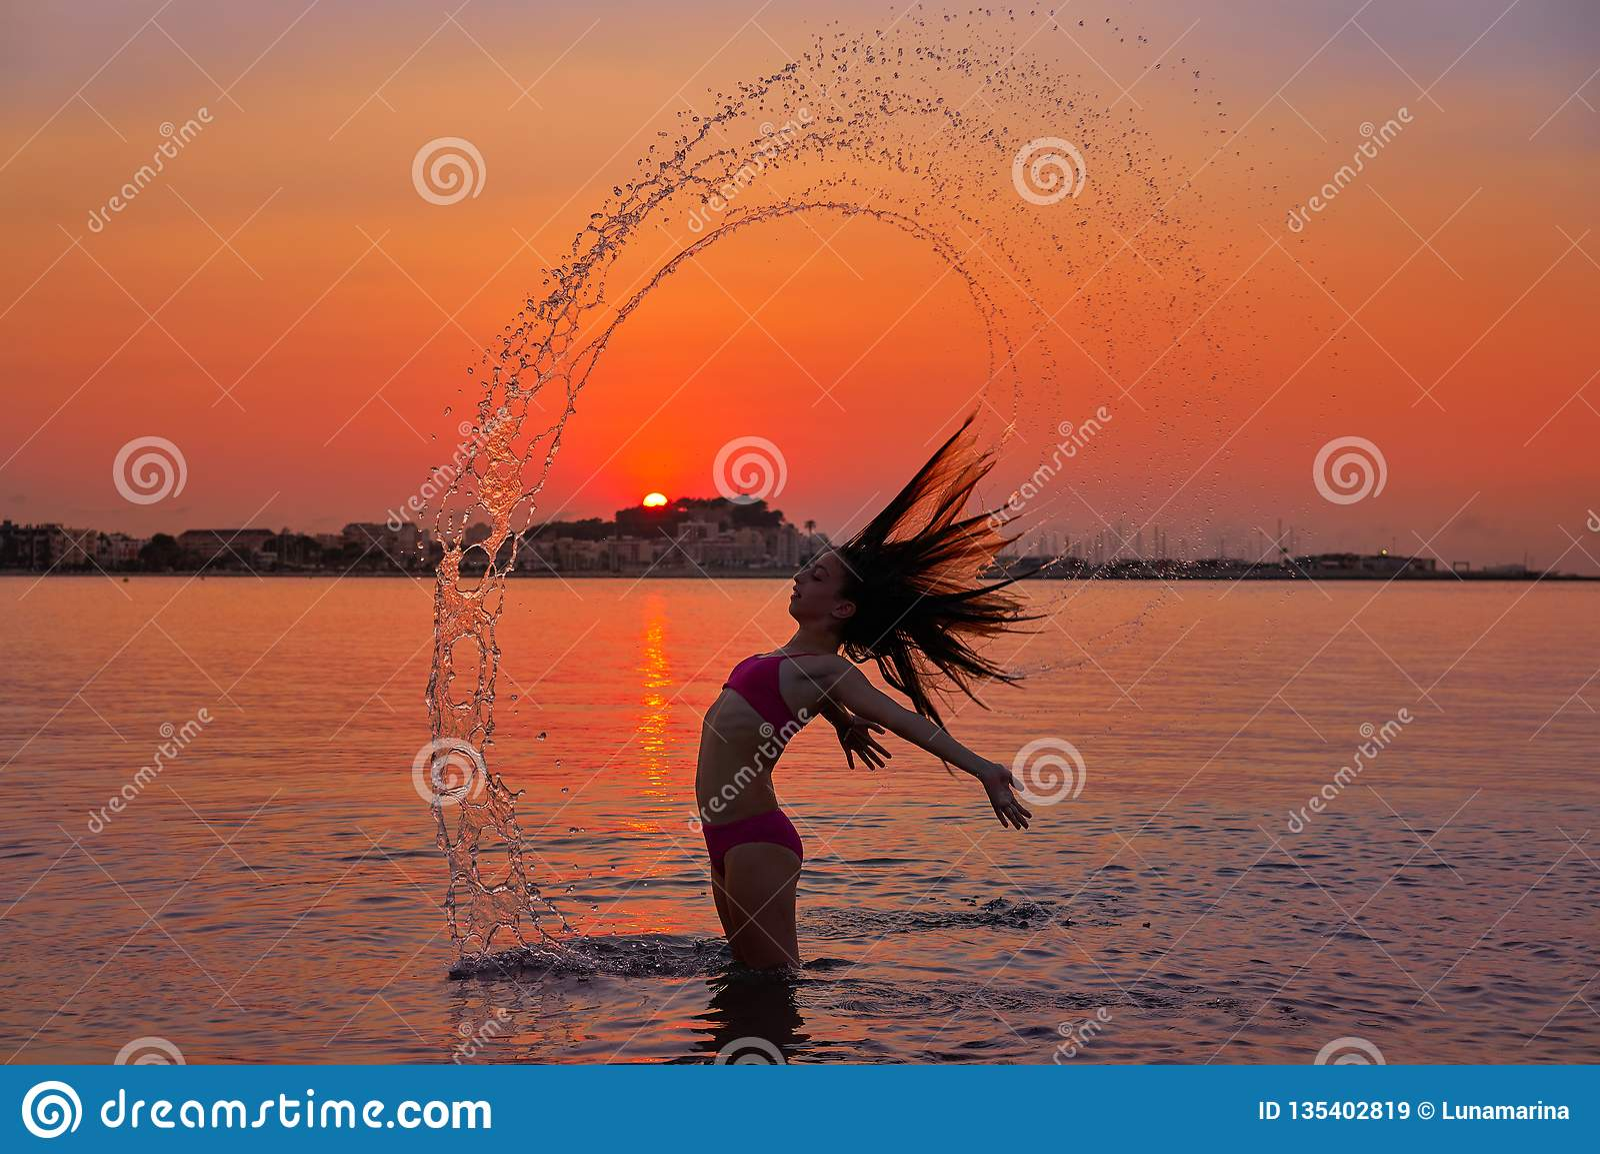 Girl flipping hair flip at sunset beach